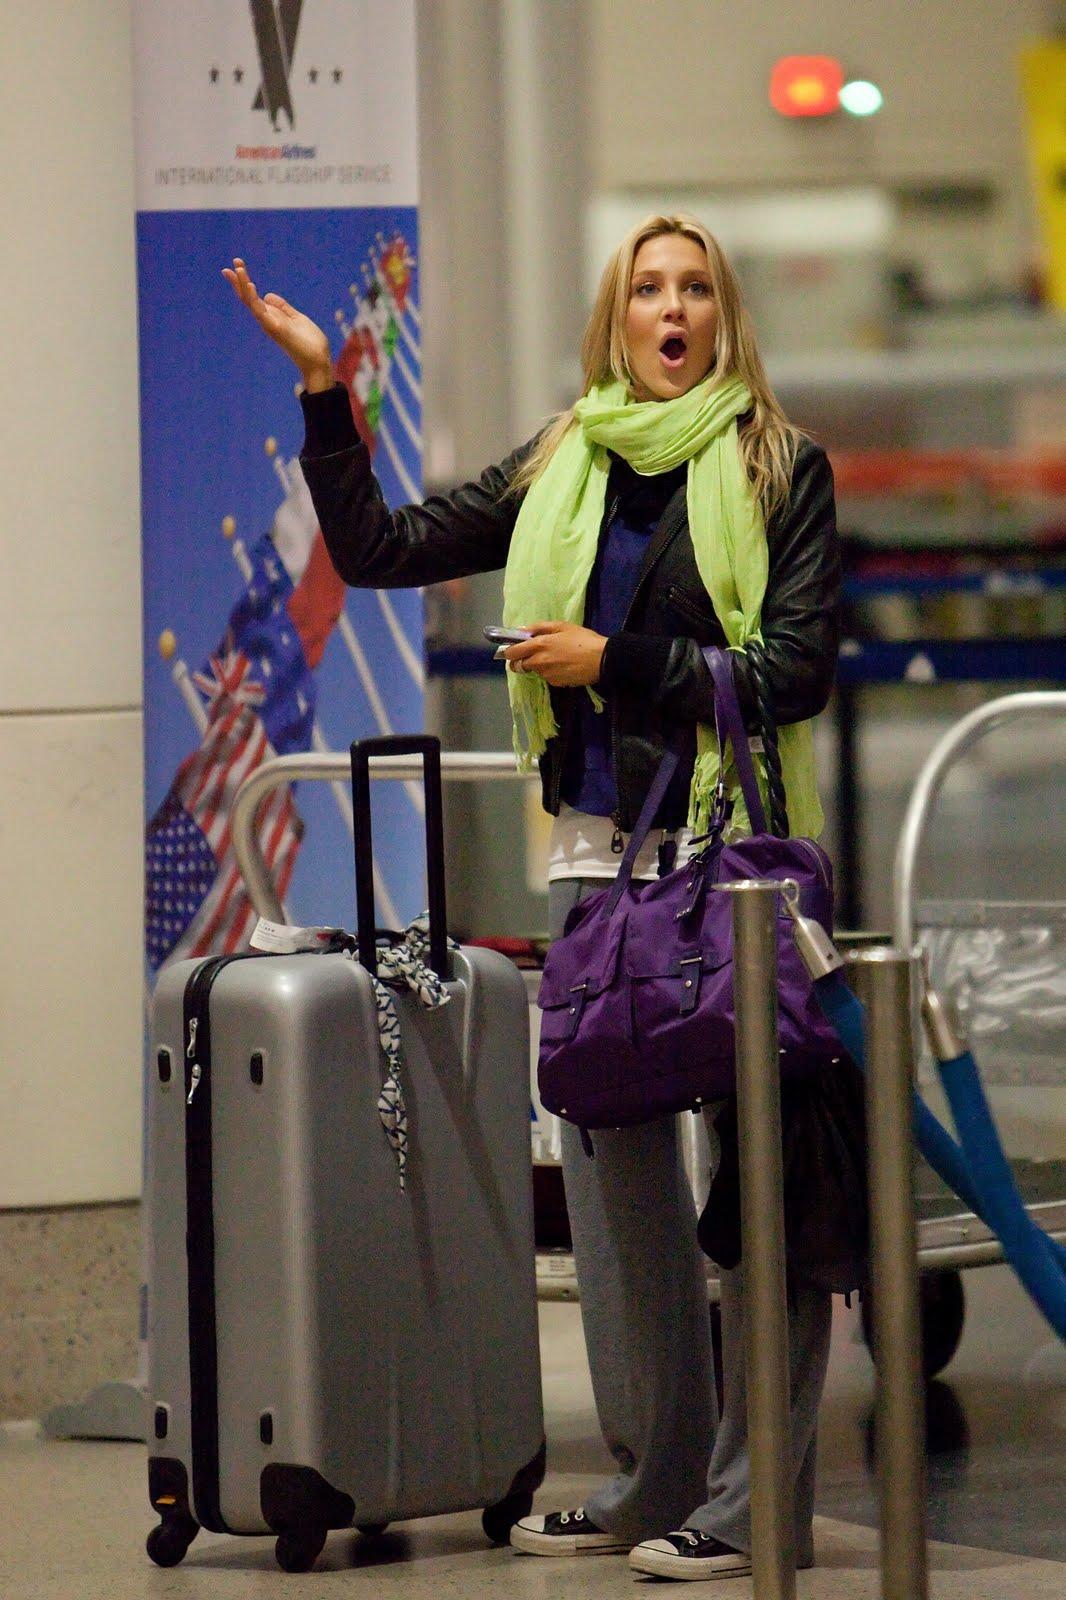 [airport8.jpg]